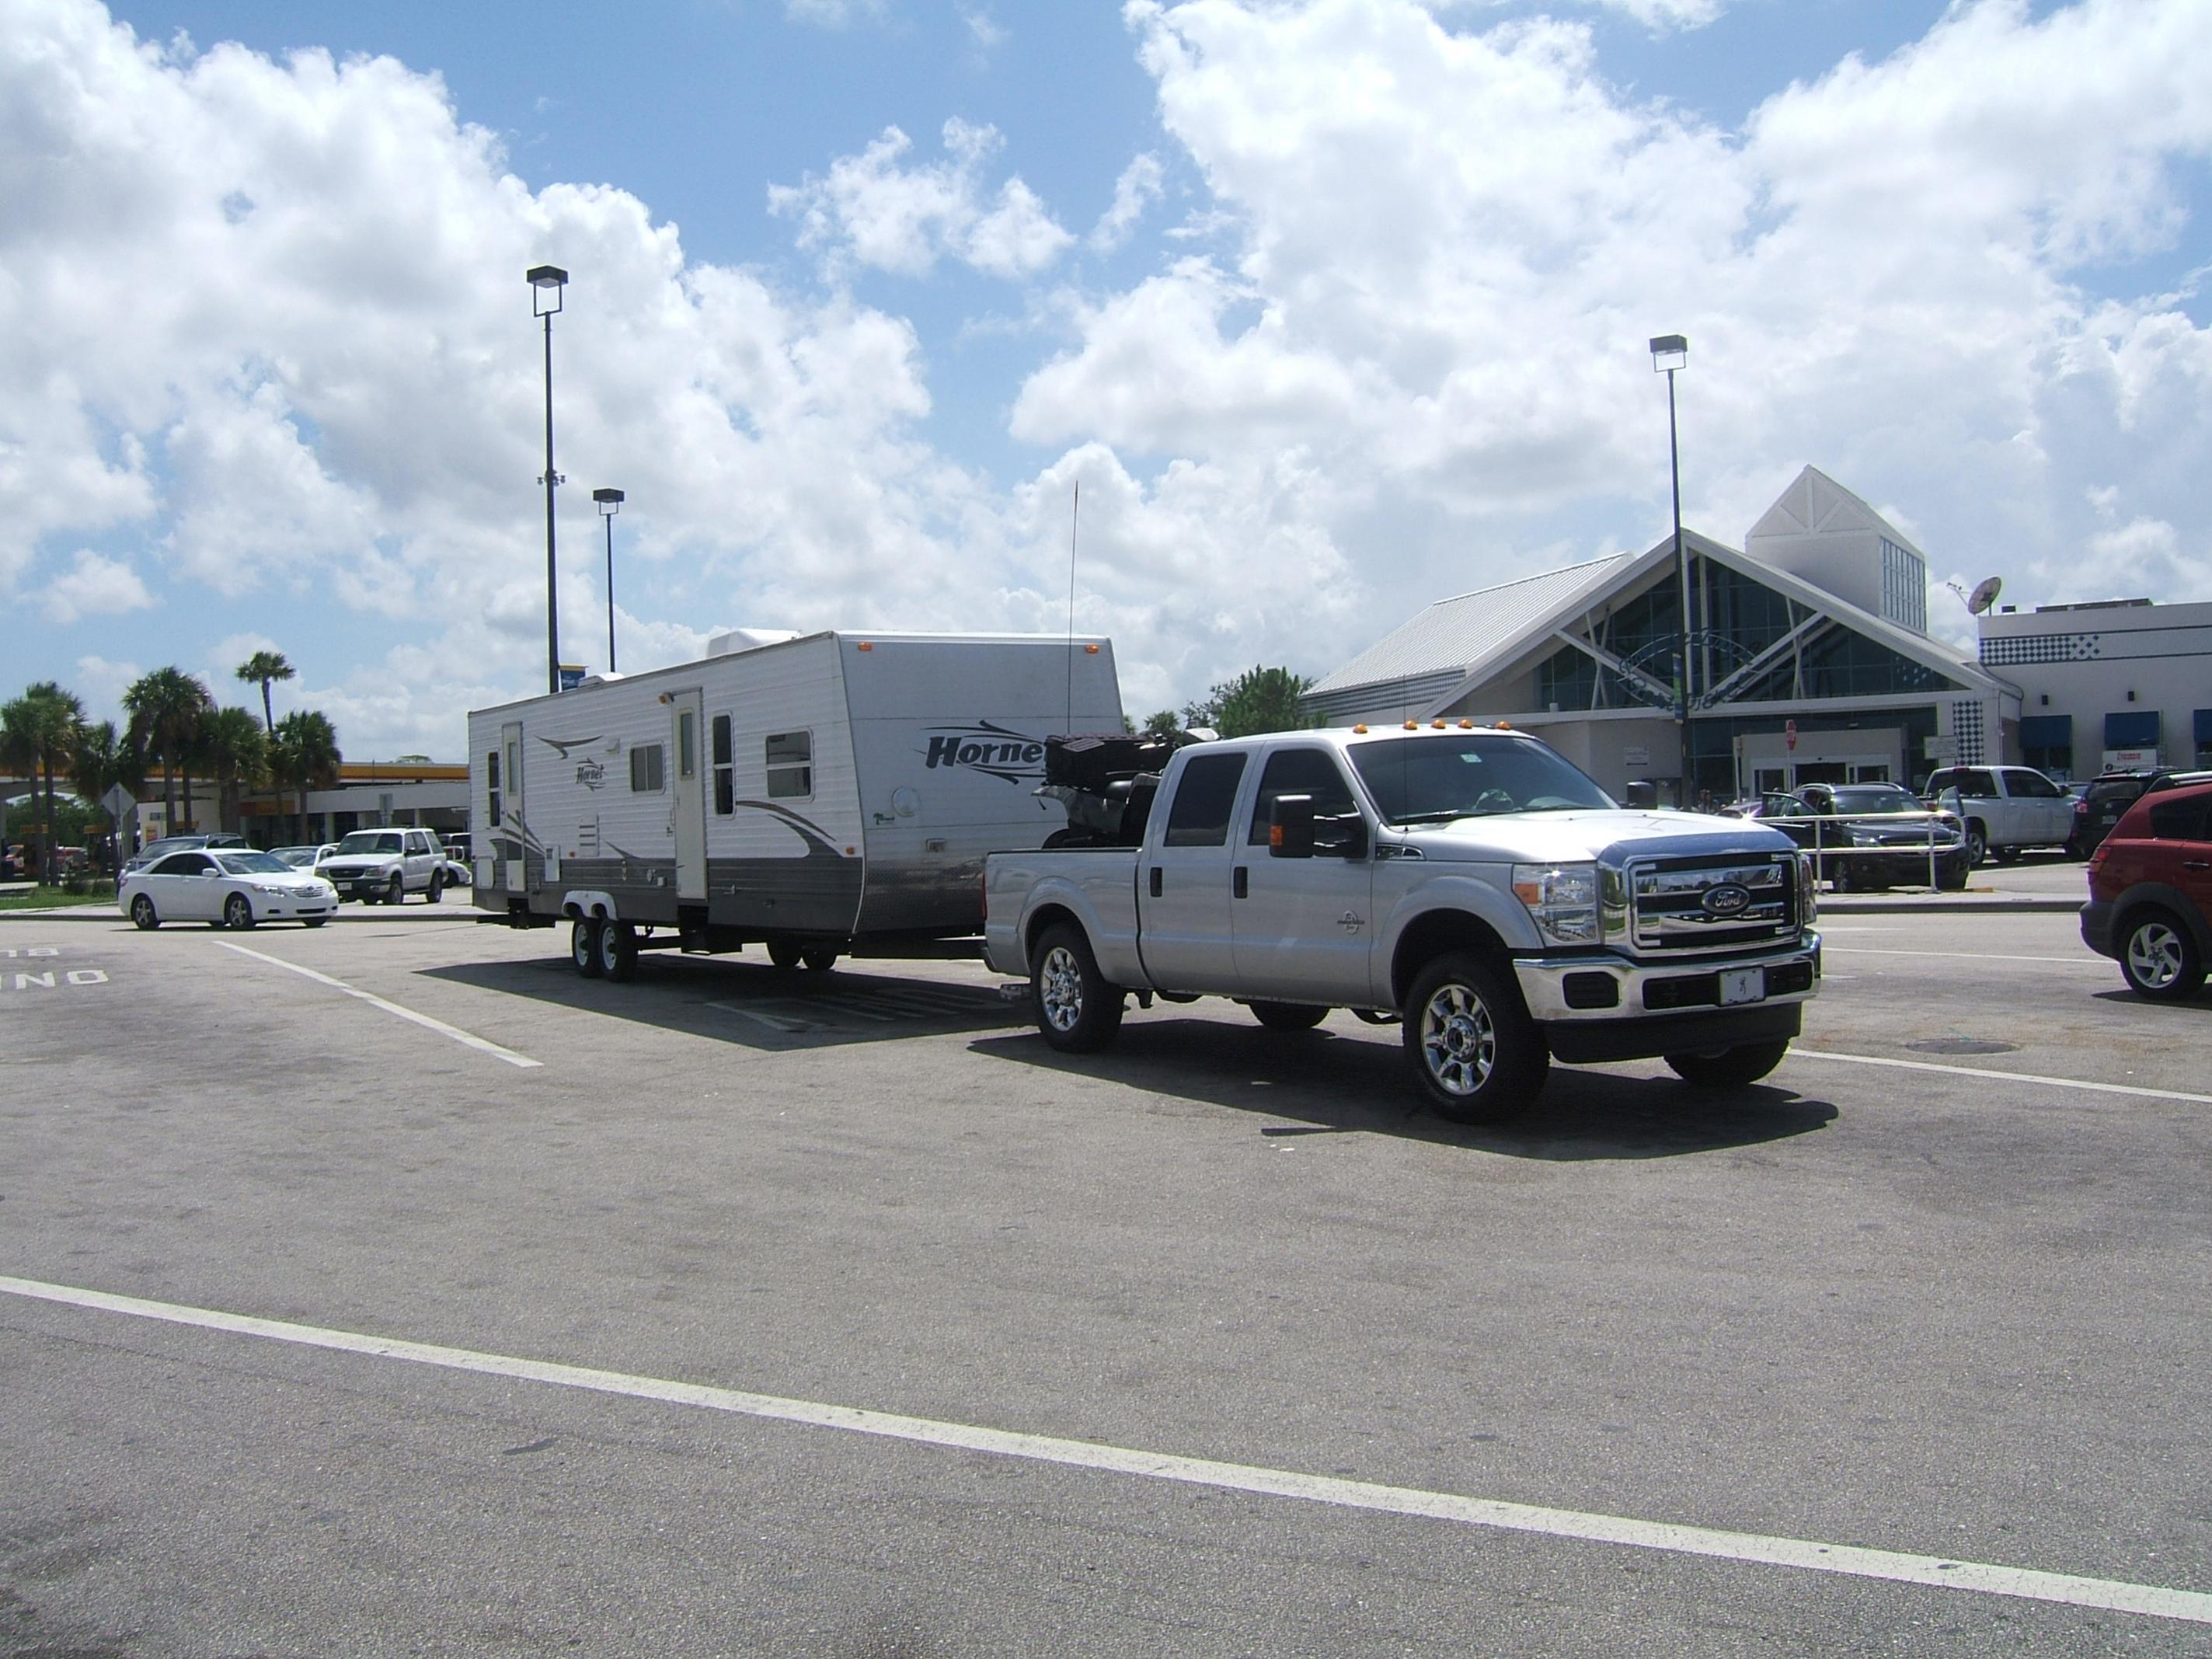 2019 F350 Super Duty Srw 5th Wheel Towing Capacity | 2019 Trucks